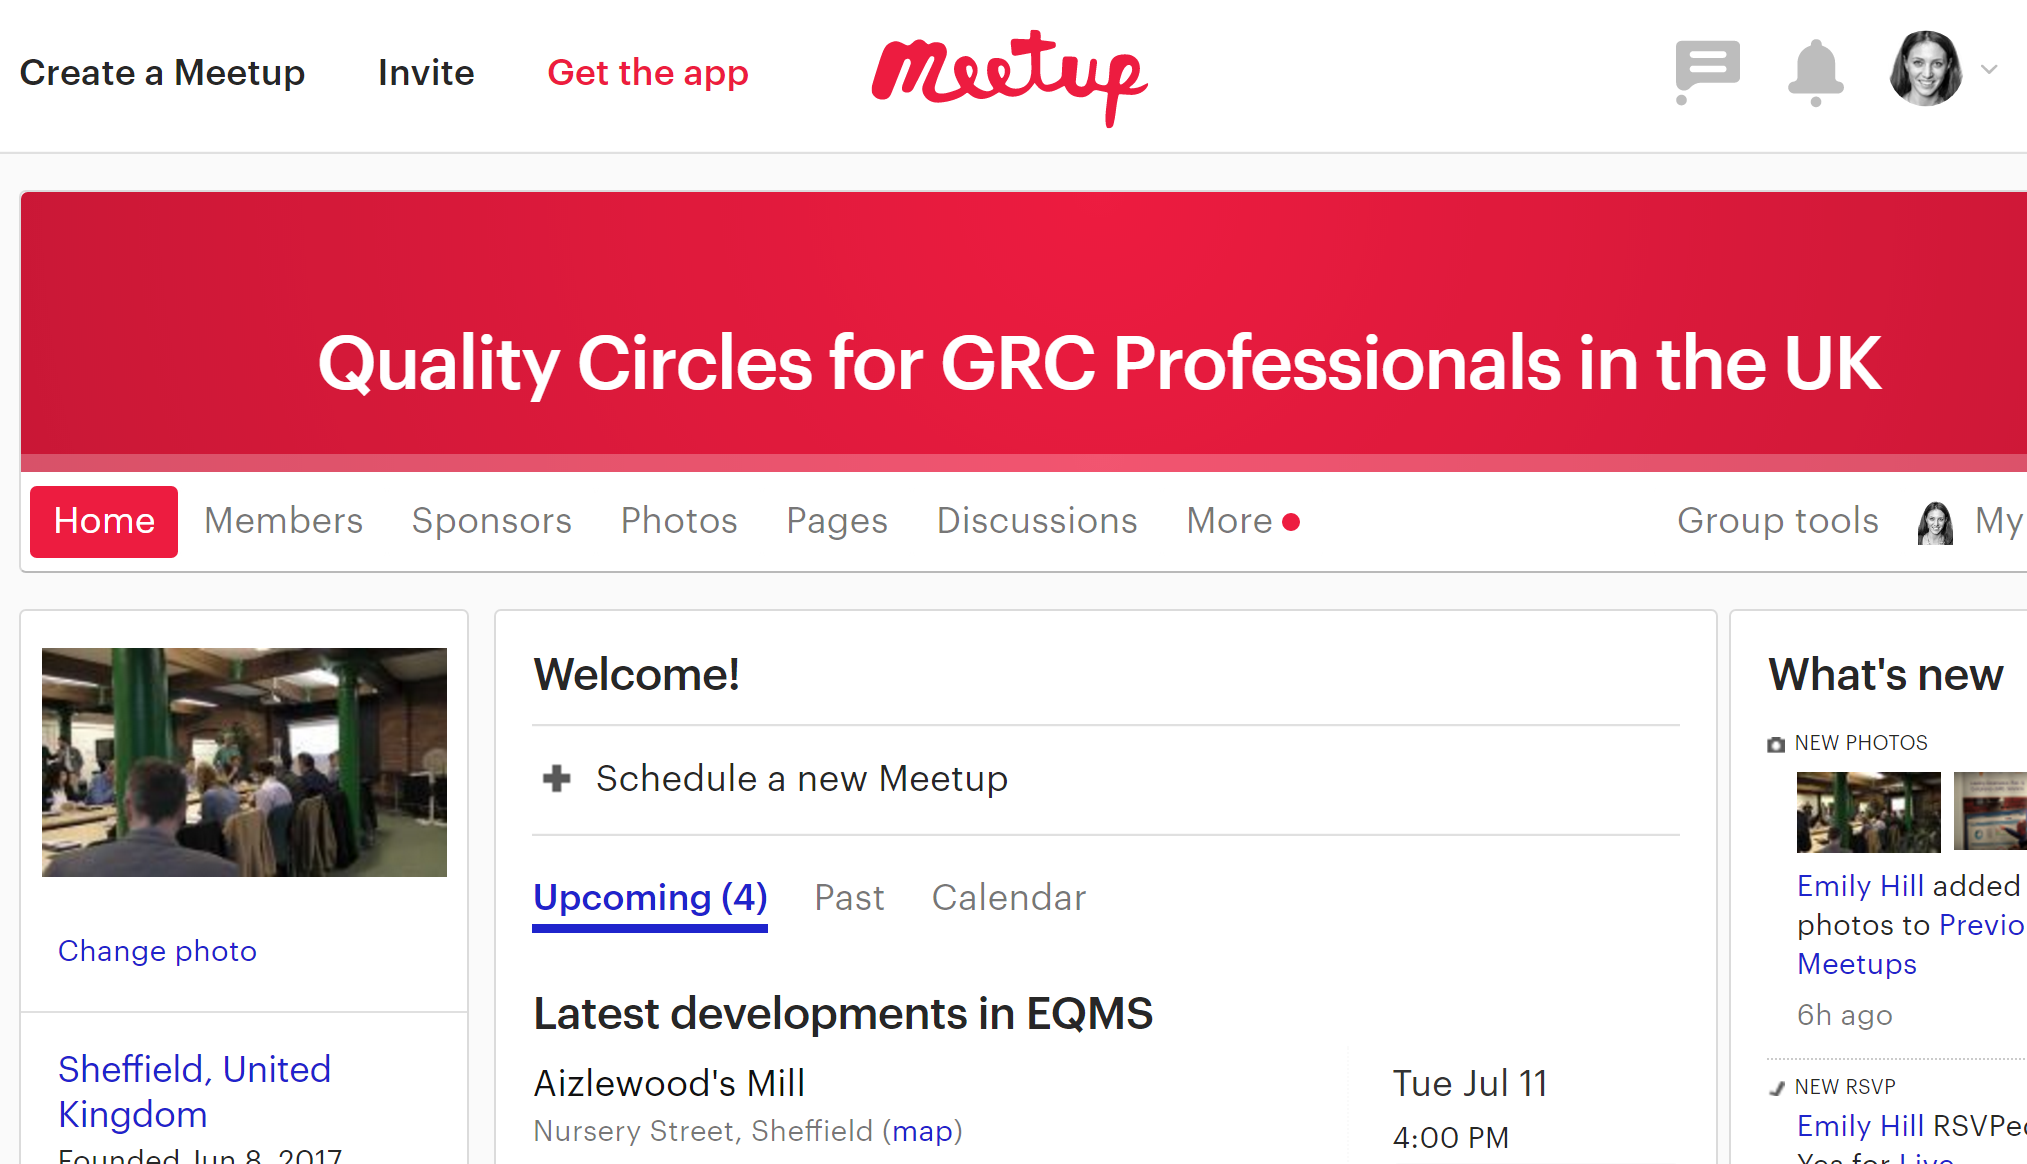 Meetup page